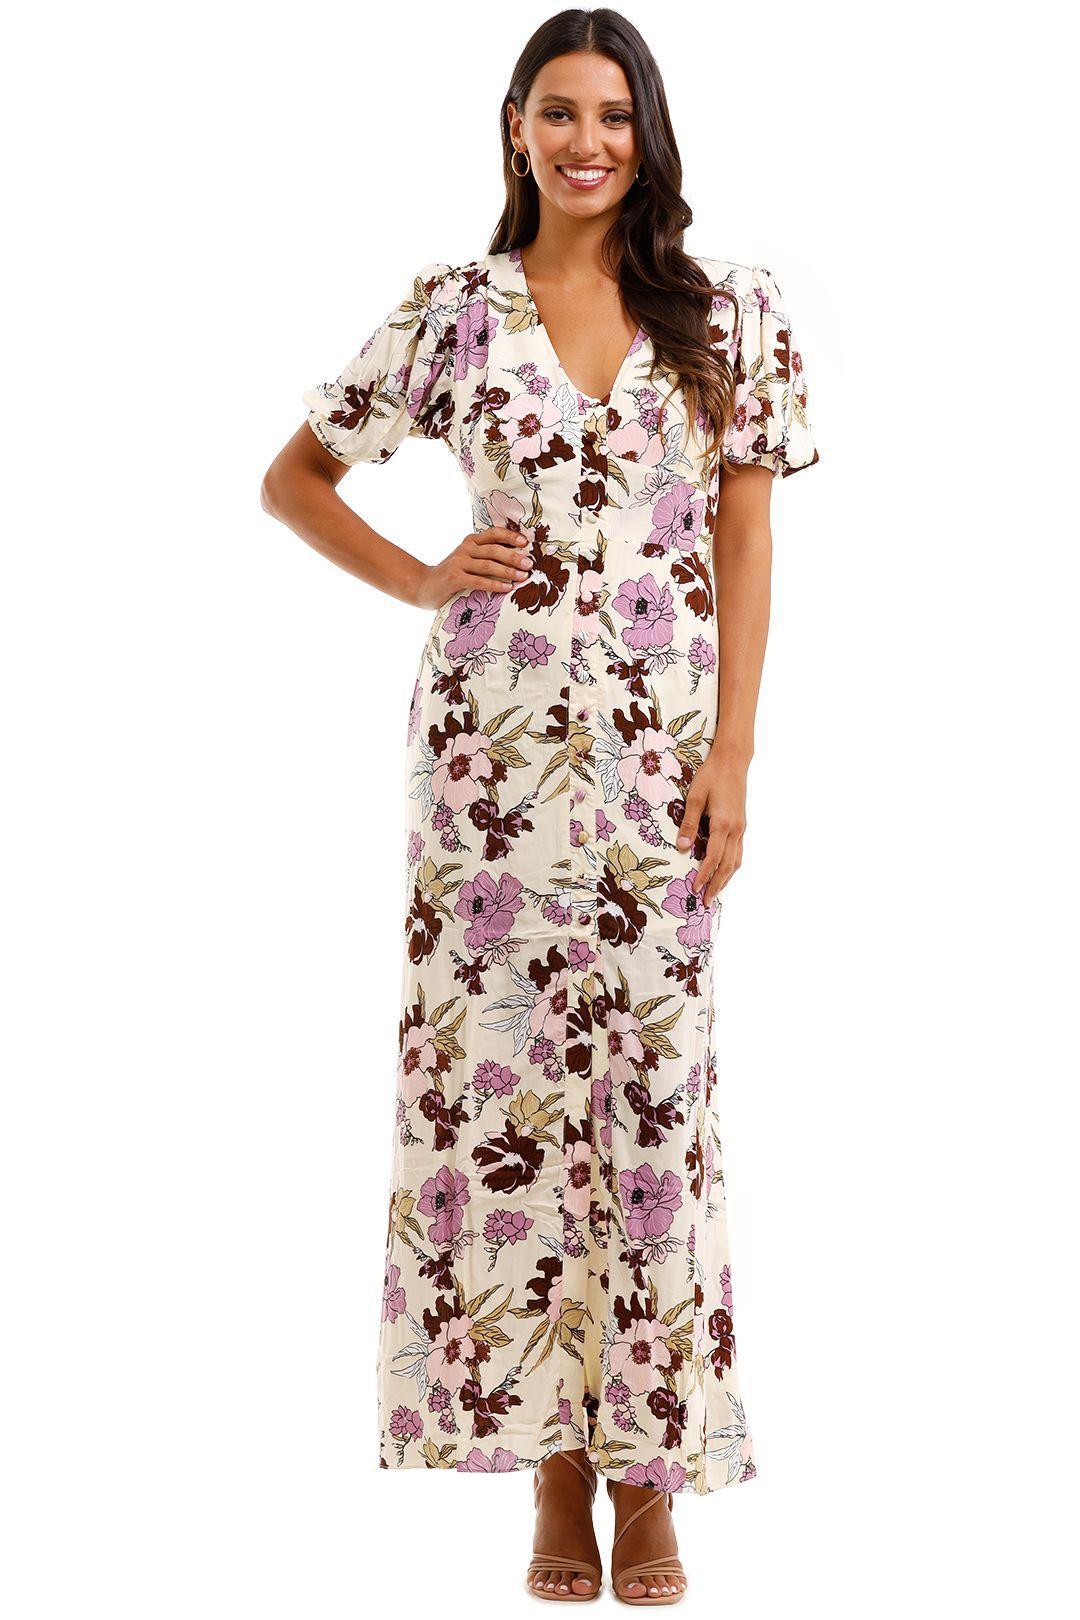 MLM Label Nile Maxi Dress Aster Floral Light Boho Feminine